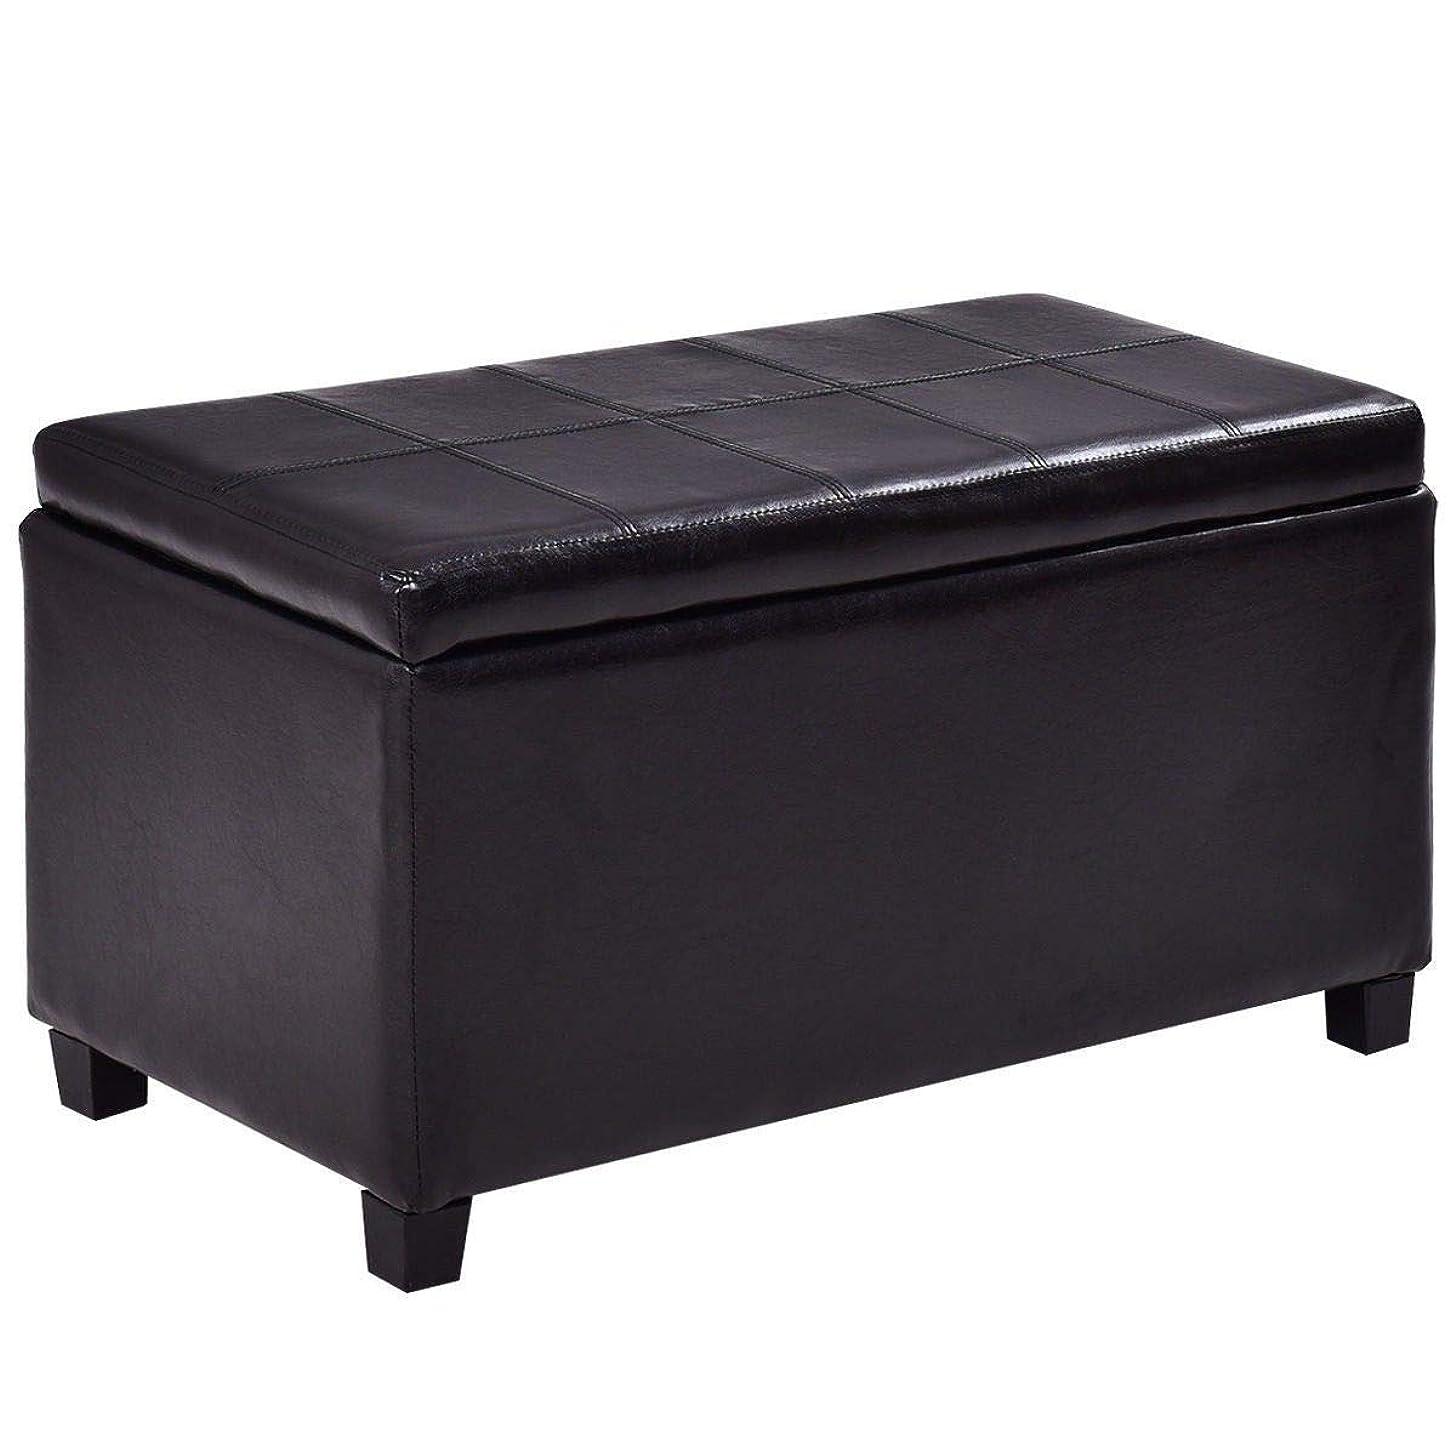 Black Large PU Leather Bench Pouffe Box Lounge Storage Seat Storage Chest Storage Ottoman Bench Home Bedroom Large Footstool Organizer Furniture(U.S. Stock)